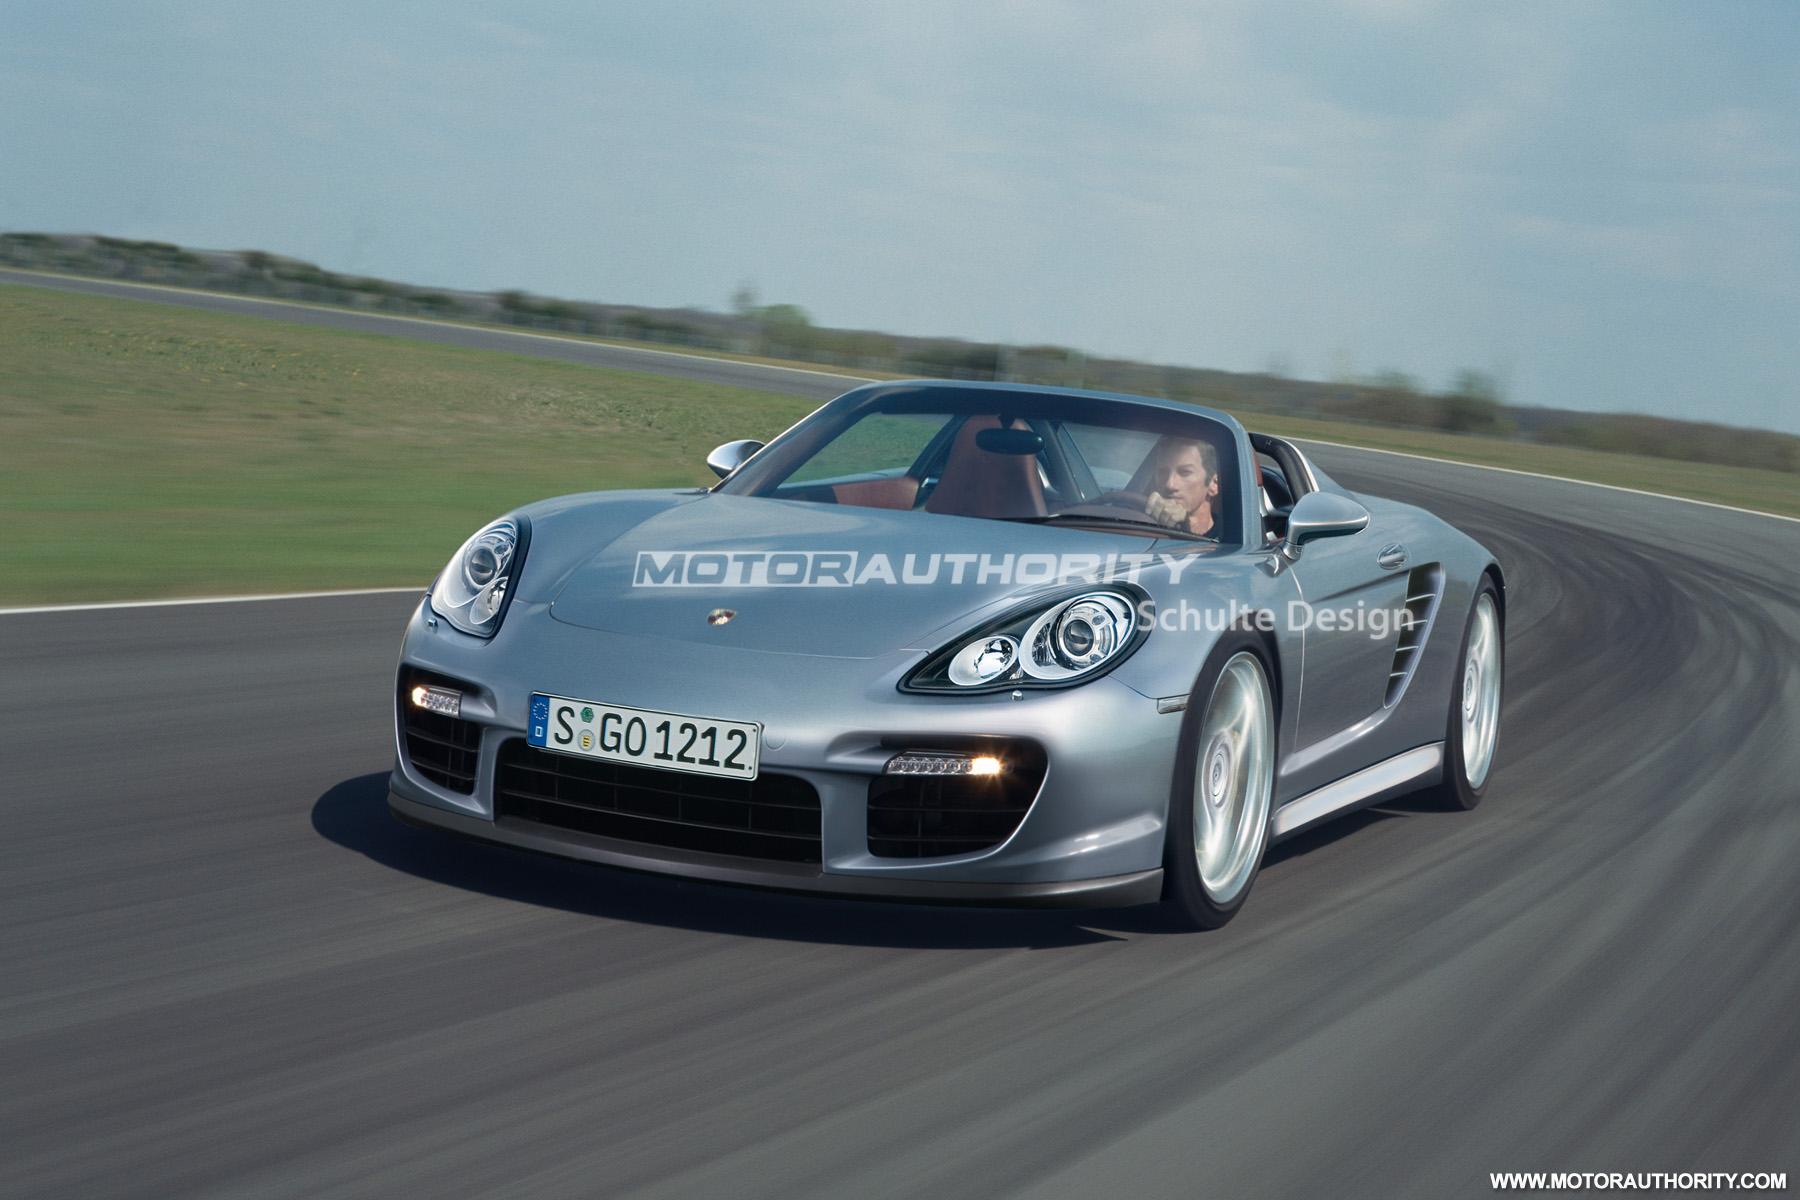 Preview Rs Spyder Based Porsche Carrera Gt Successor